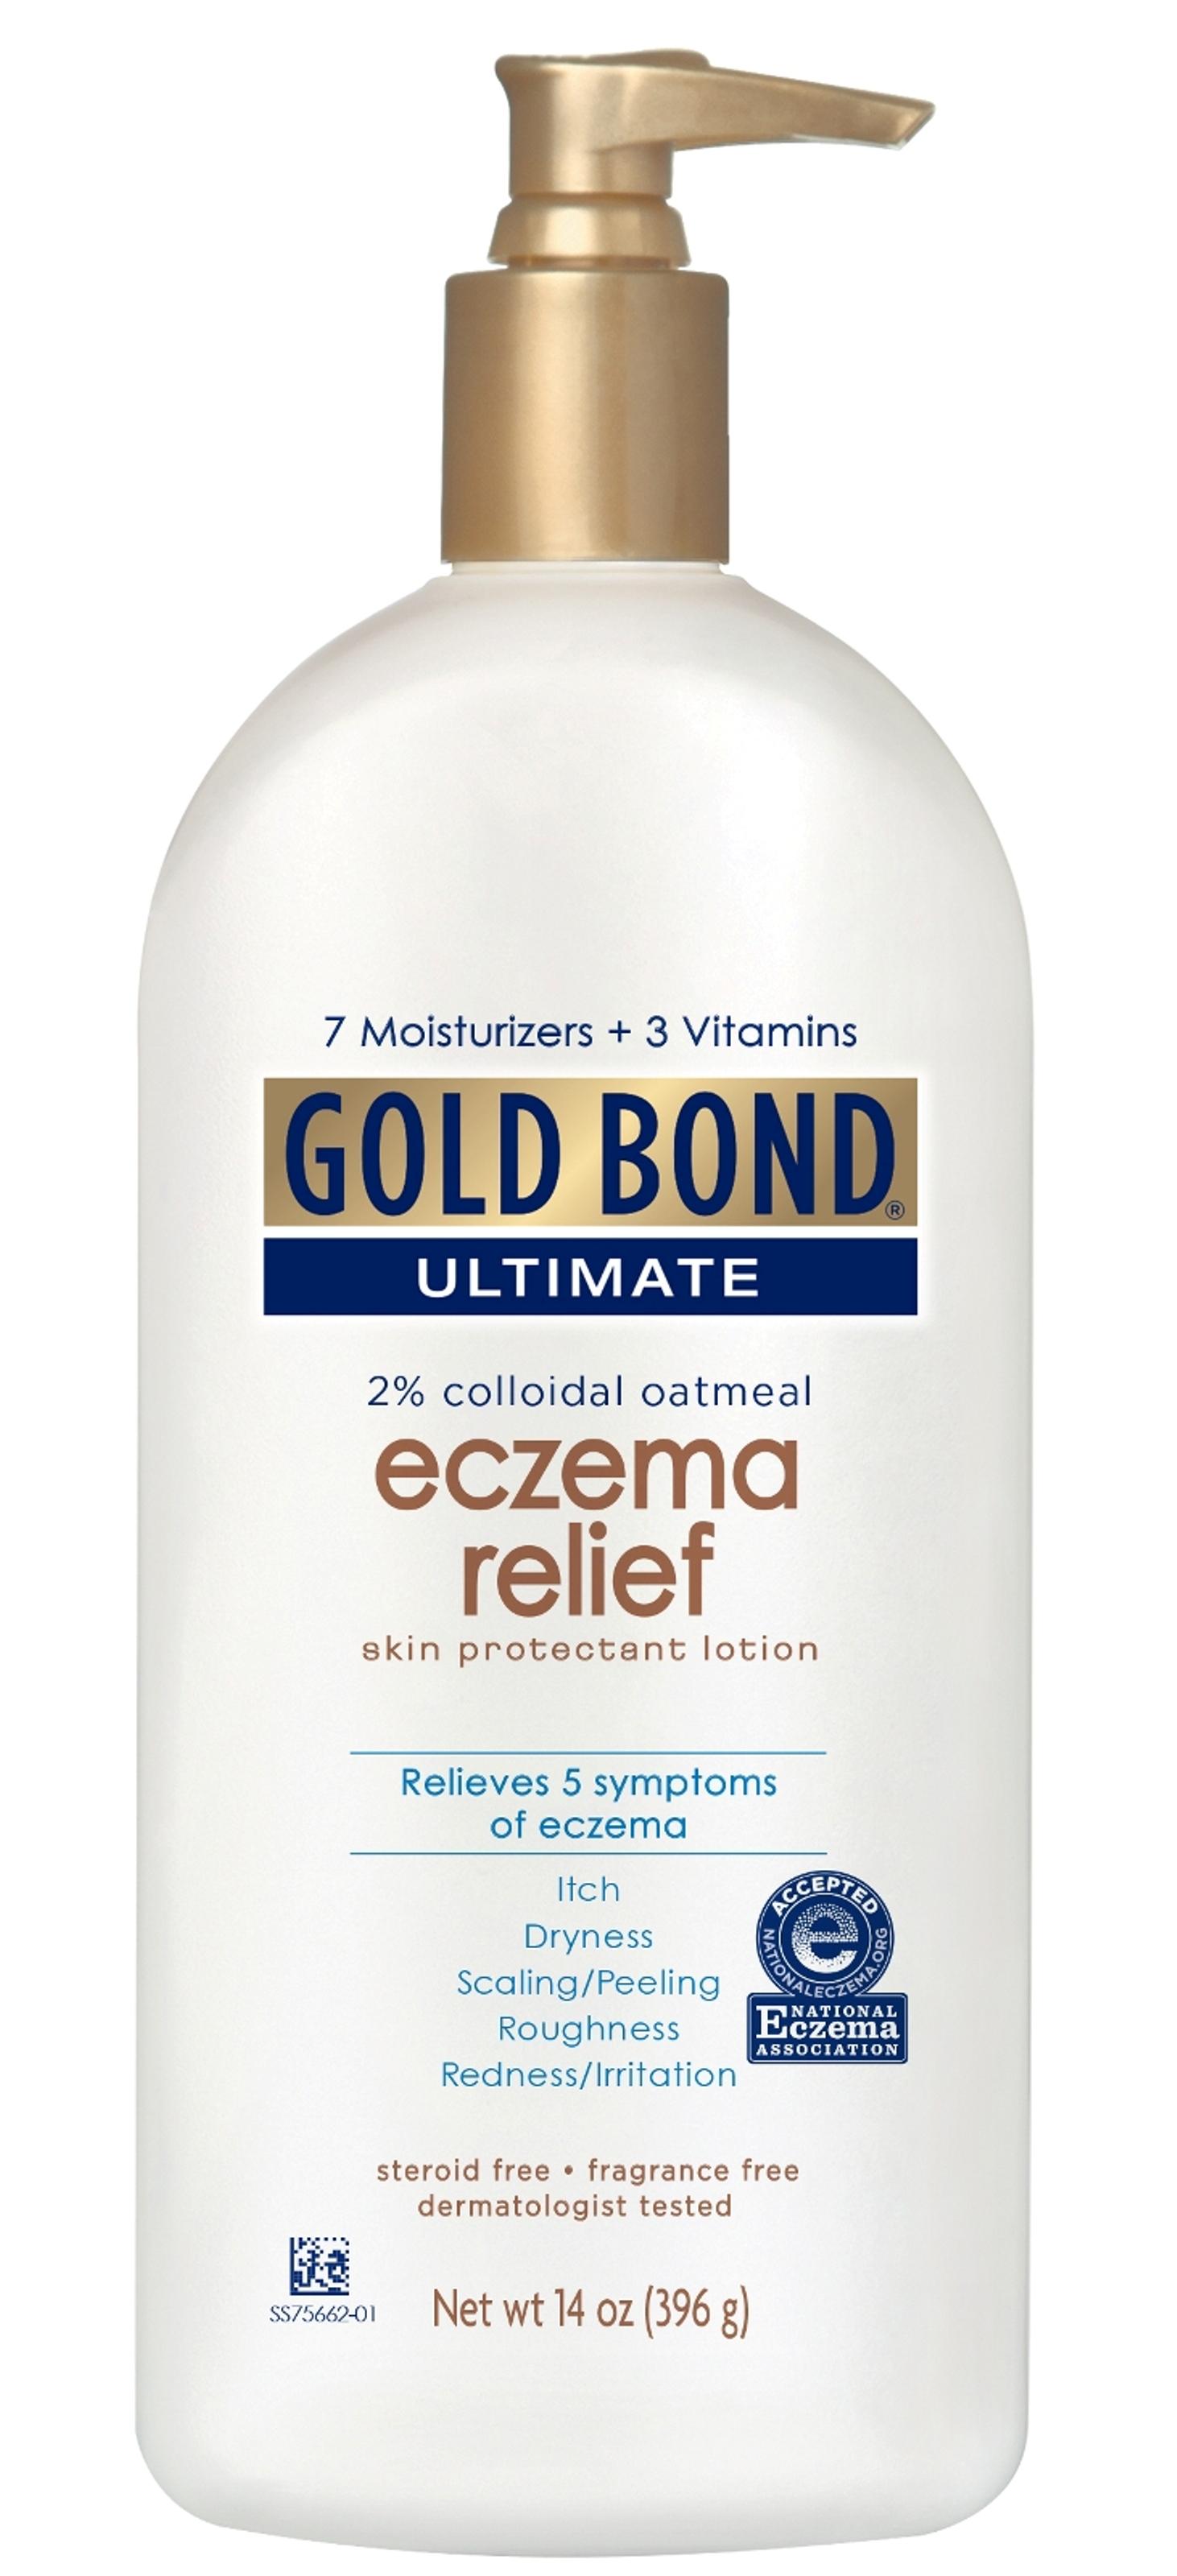 Target - Gold Bond Eczema Relief, 14 Oz. - $5.24